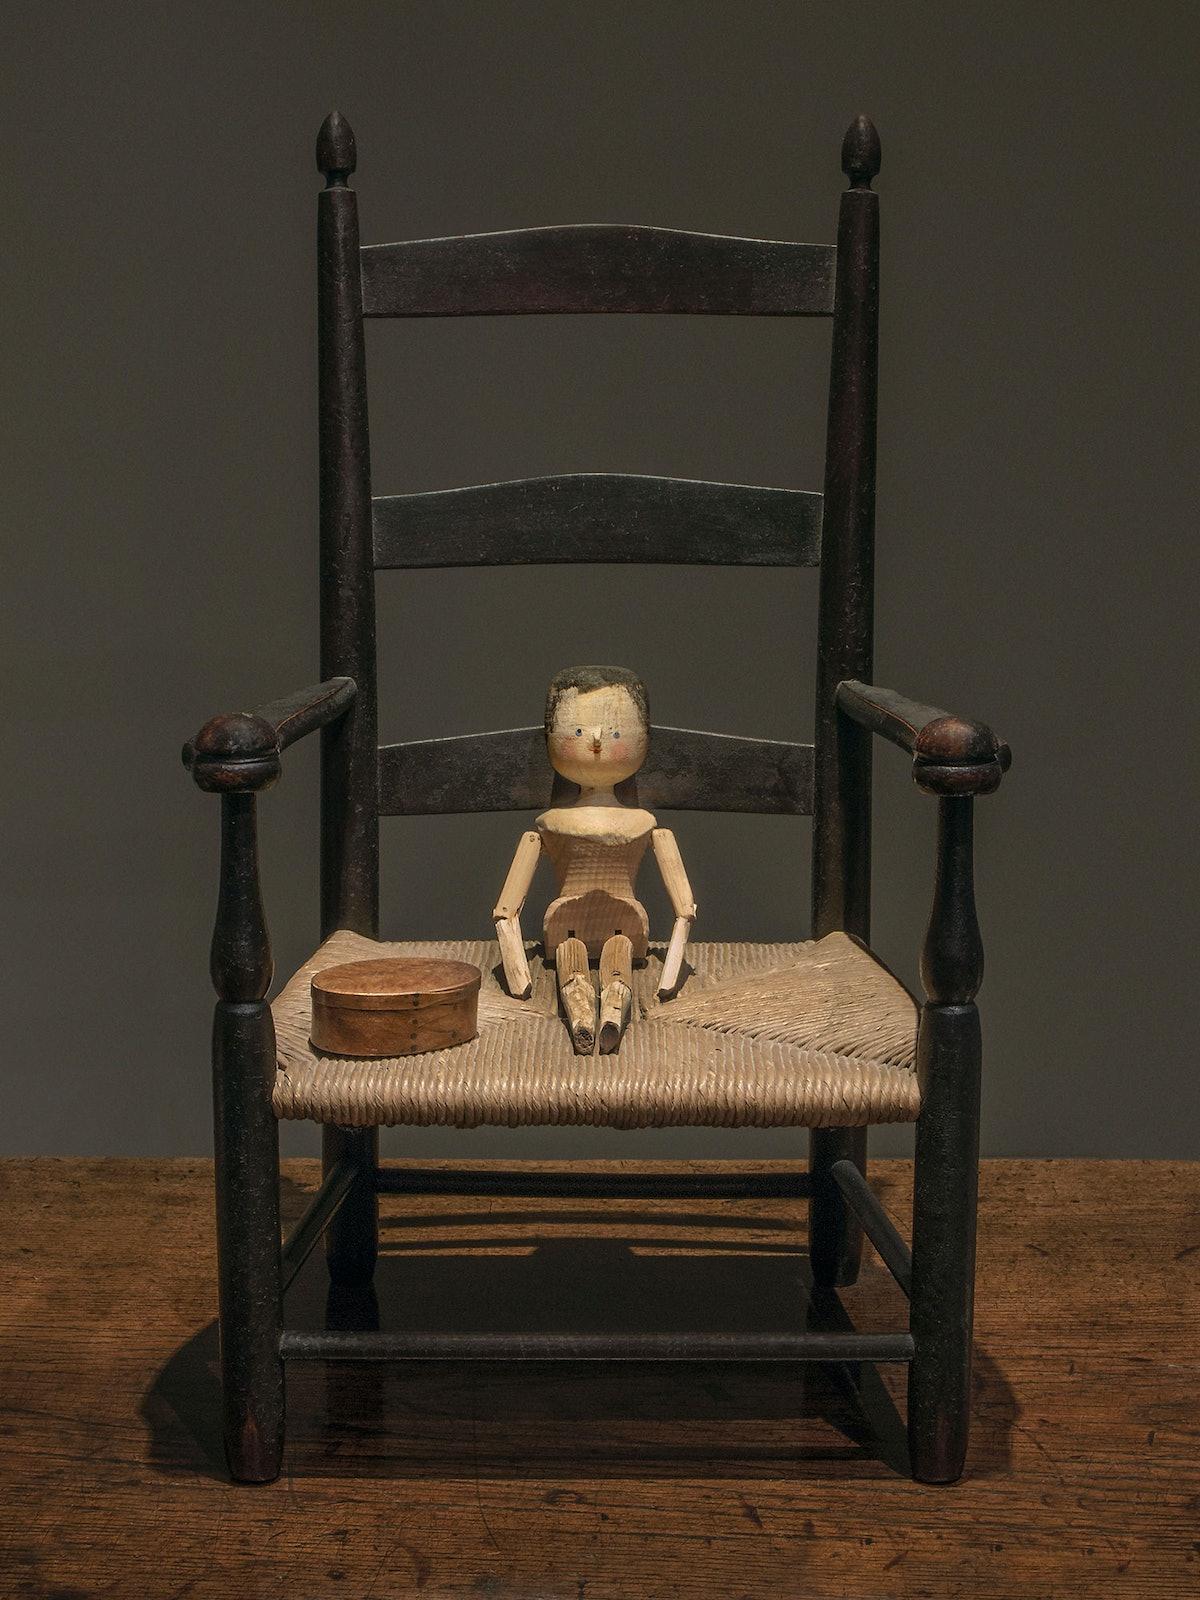 Ydessa Hendeles, From her wooden sleep…, 2013